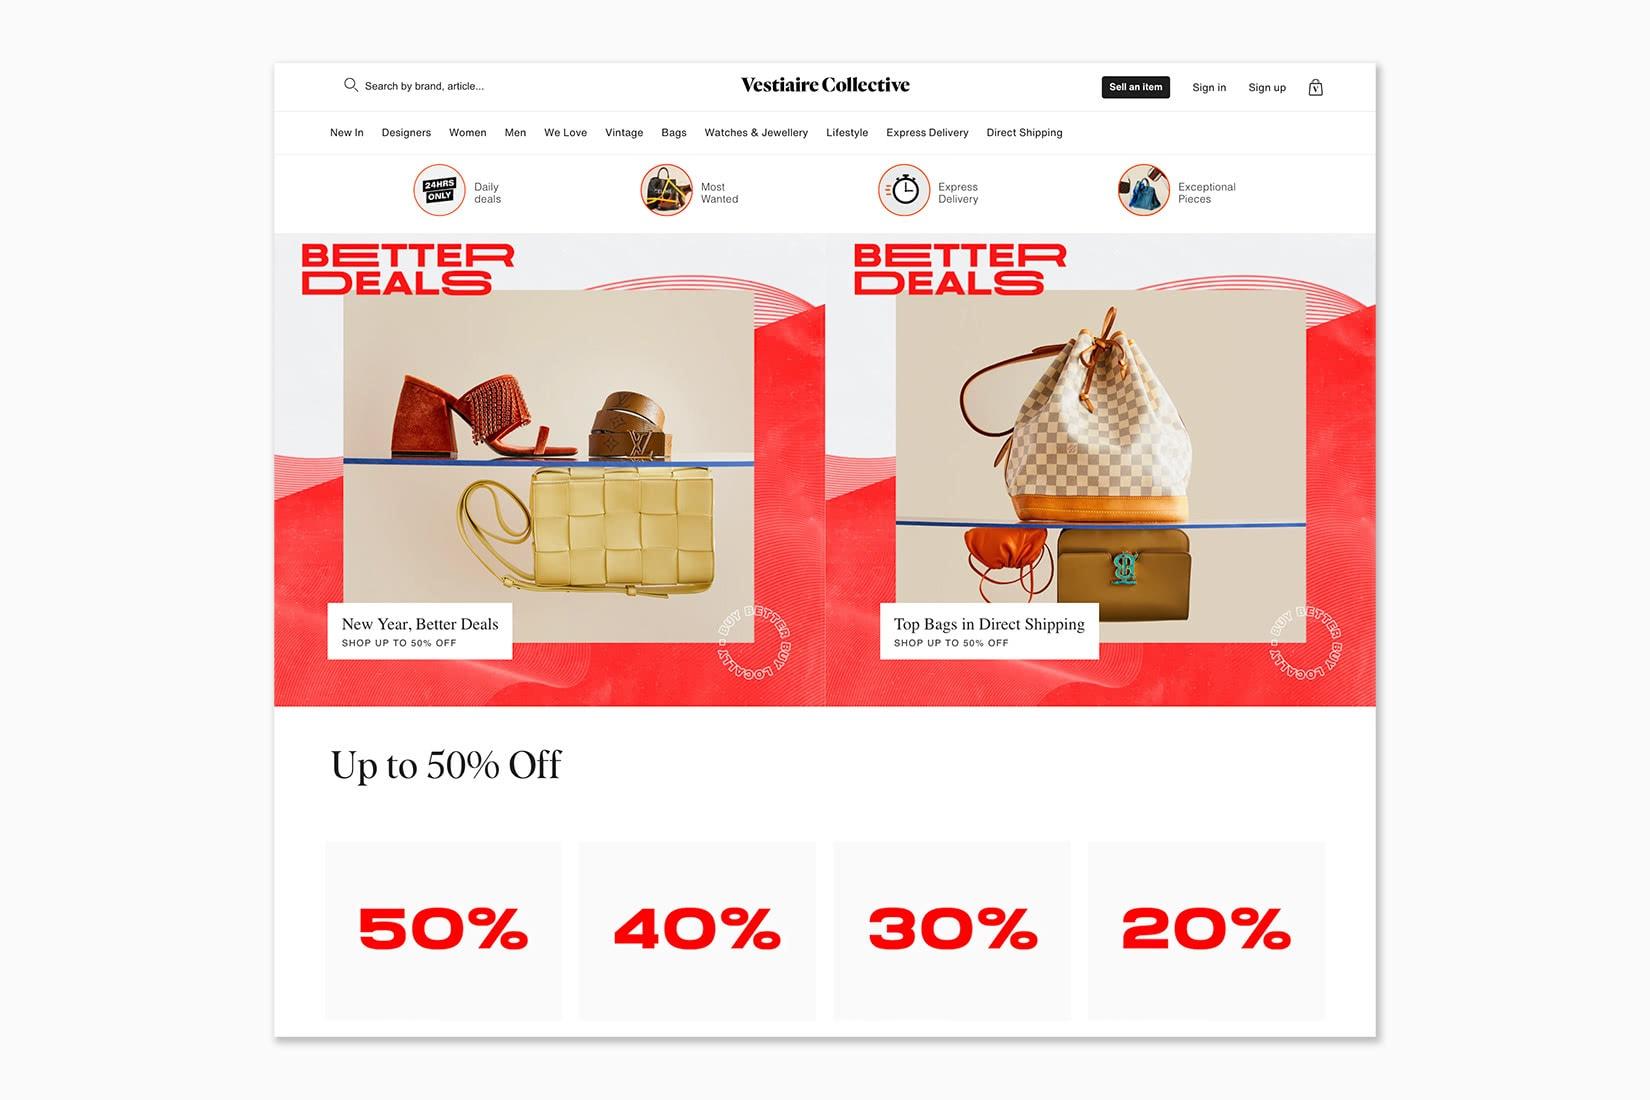 best online shopping sites women vestiaire collective - Luxe Digital